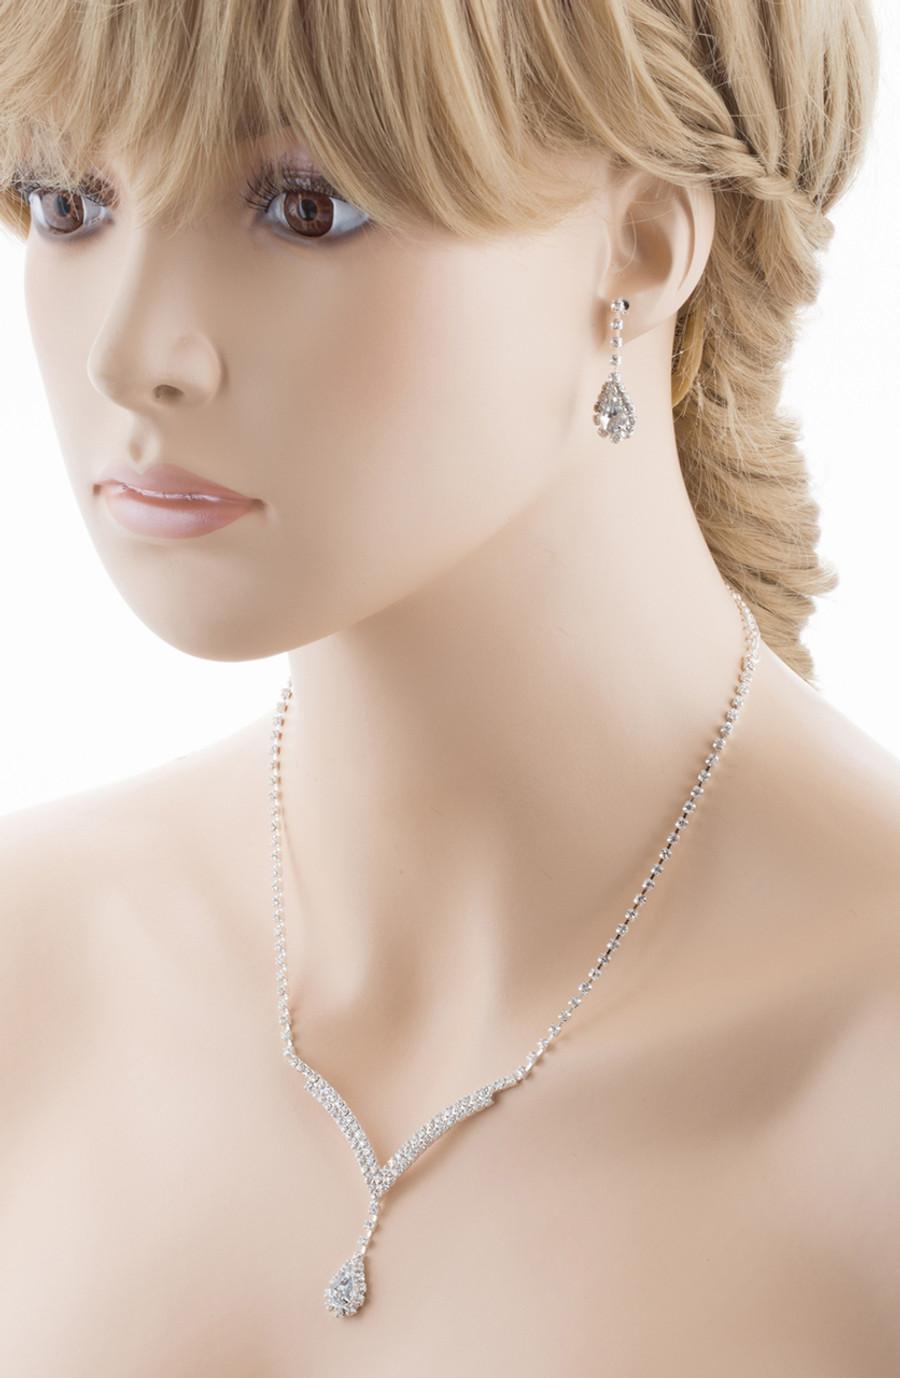 Bridal Wedding Jewelry Set Necklace Earring Crystal Rhinestone LG V Drop Silver